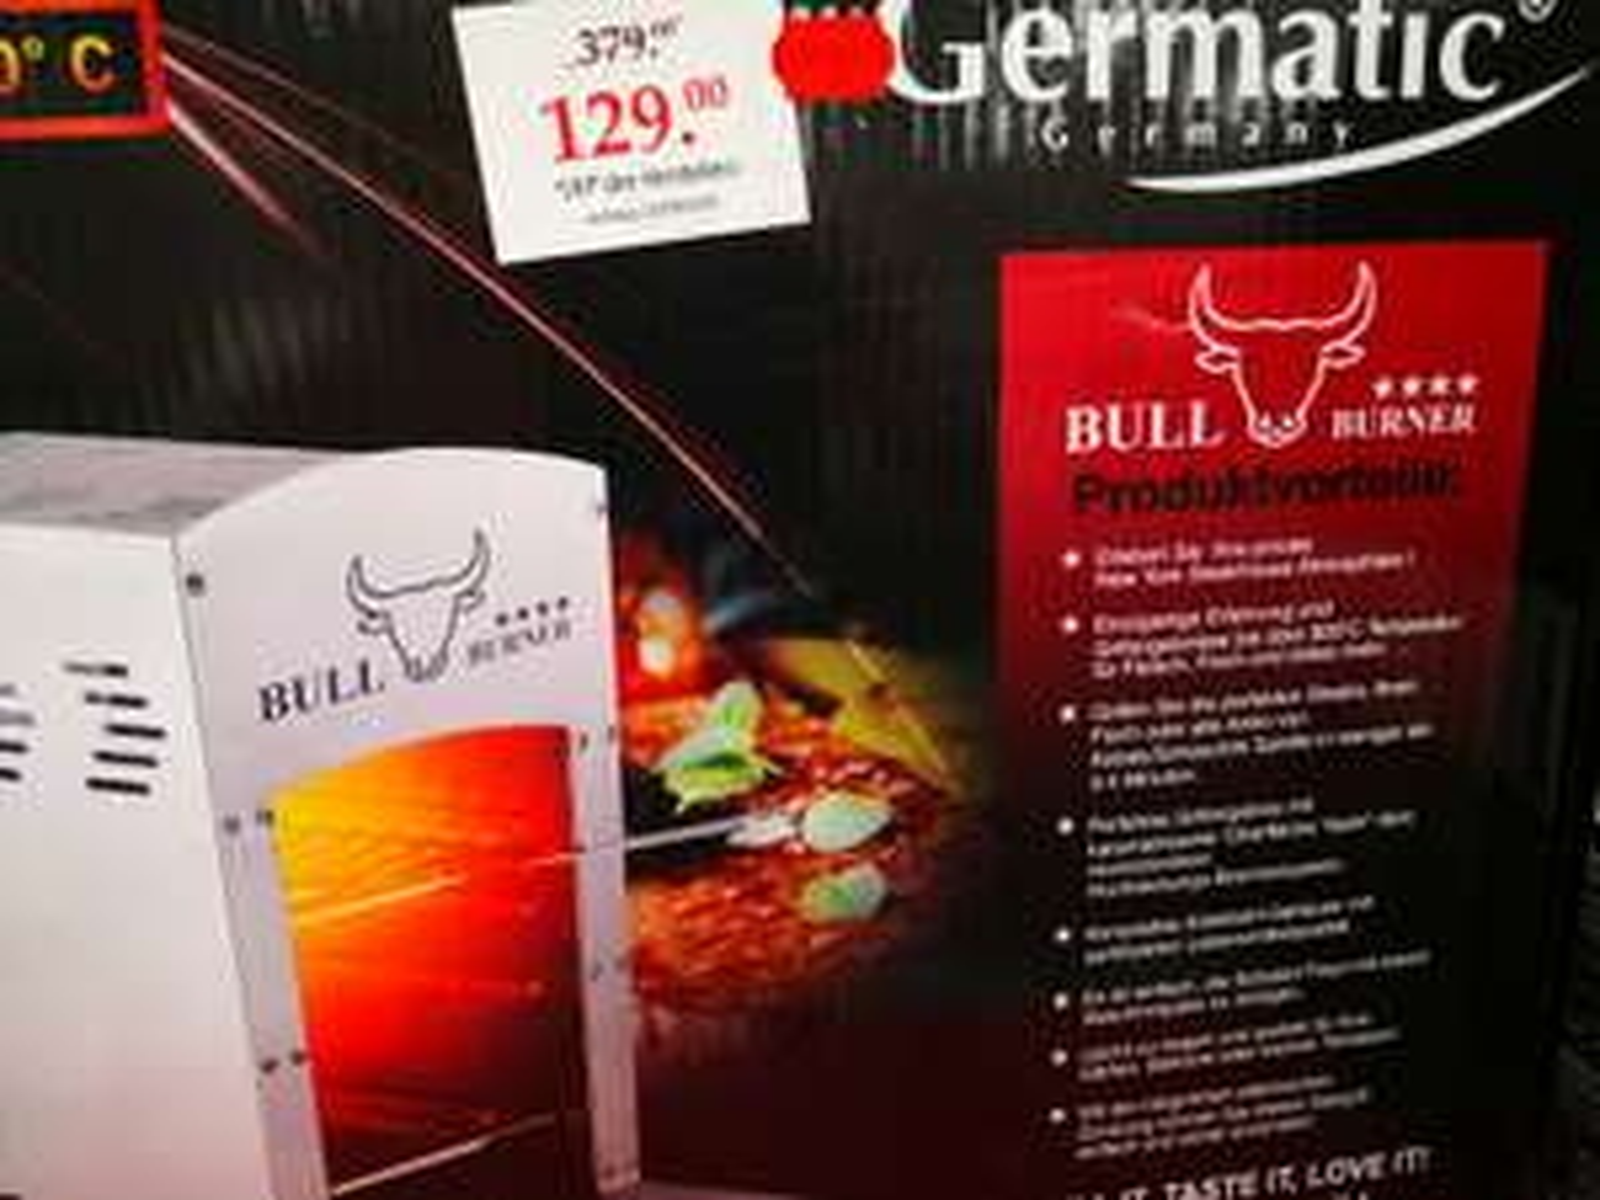 Bull Burner Gasgrill - Woolworth 40764 Langenfeld [Lokal]